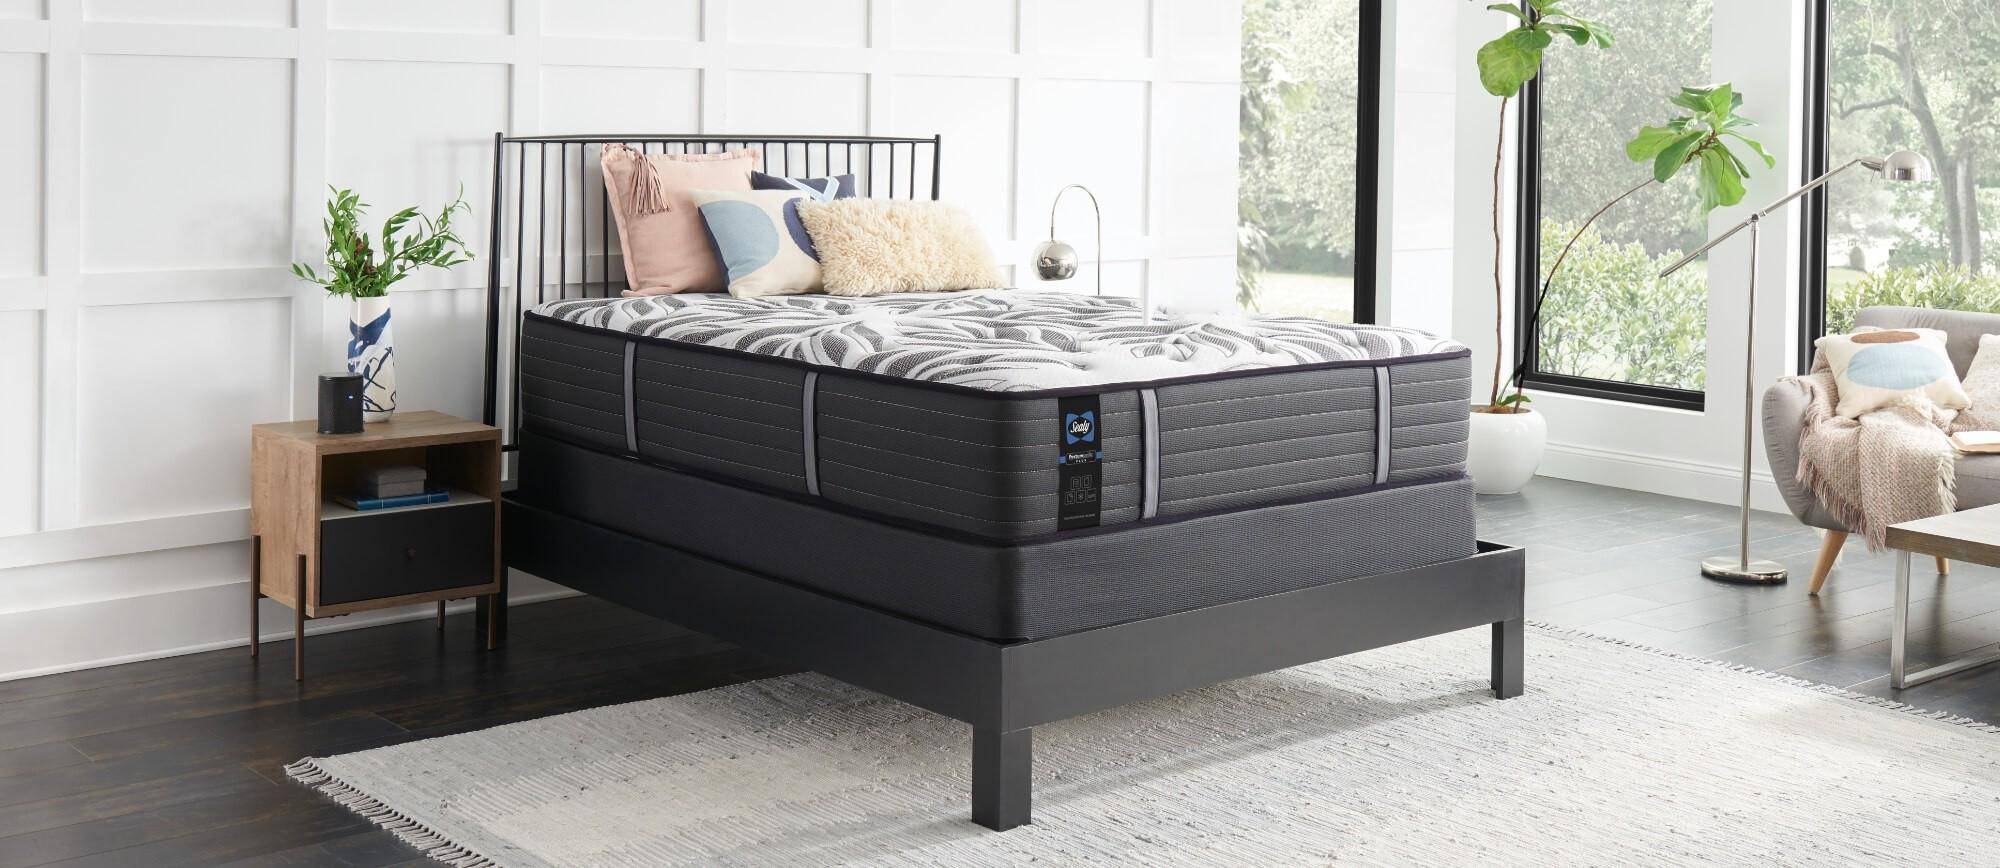 A Posturepedic Plus mattress in a styled mattress